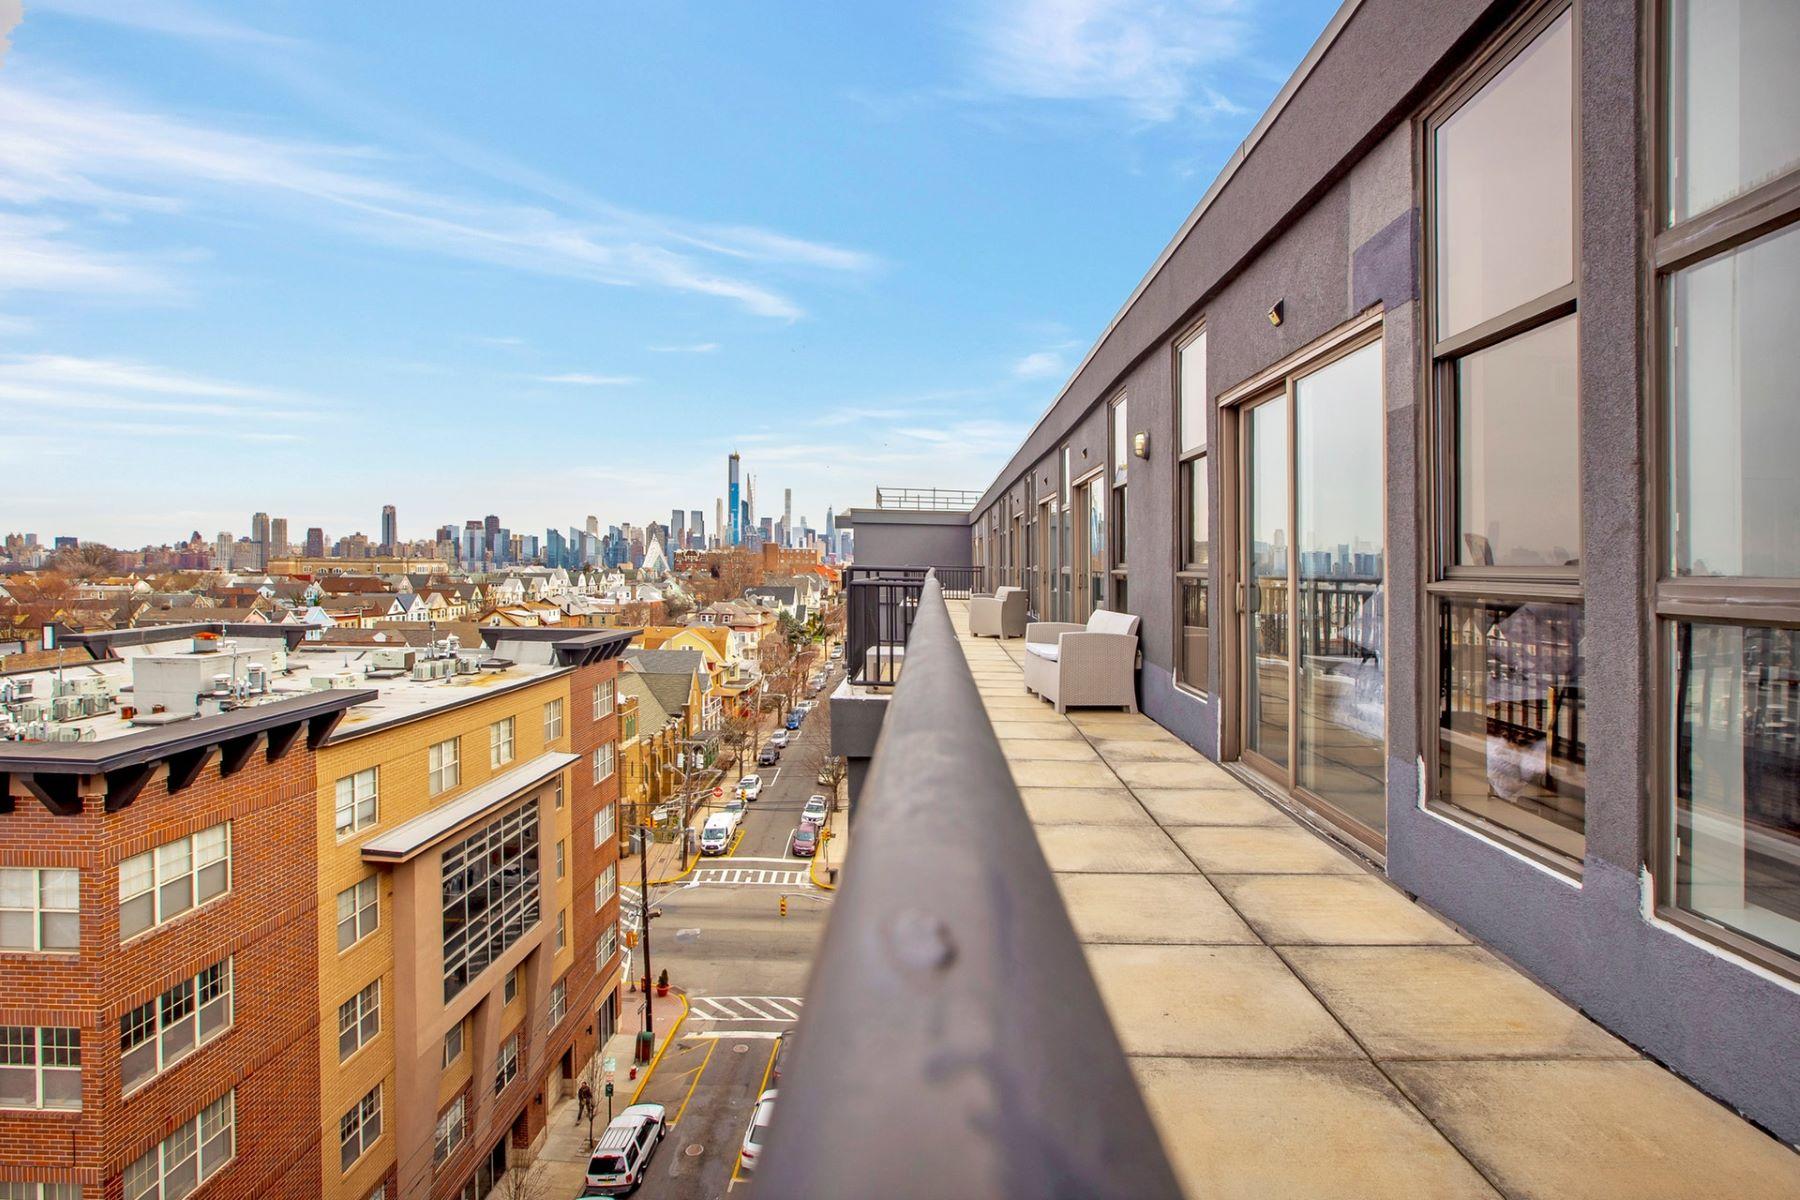 Condominiums vì Bán tại Union City, New Jersey 07087 Hoa Kỳ